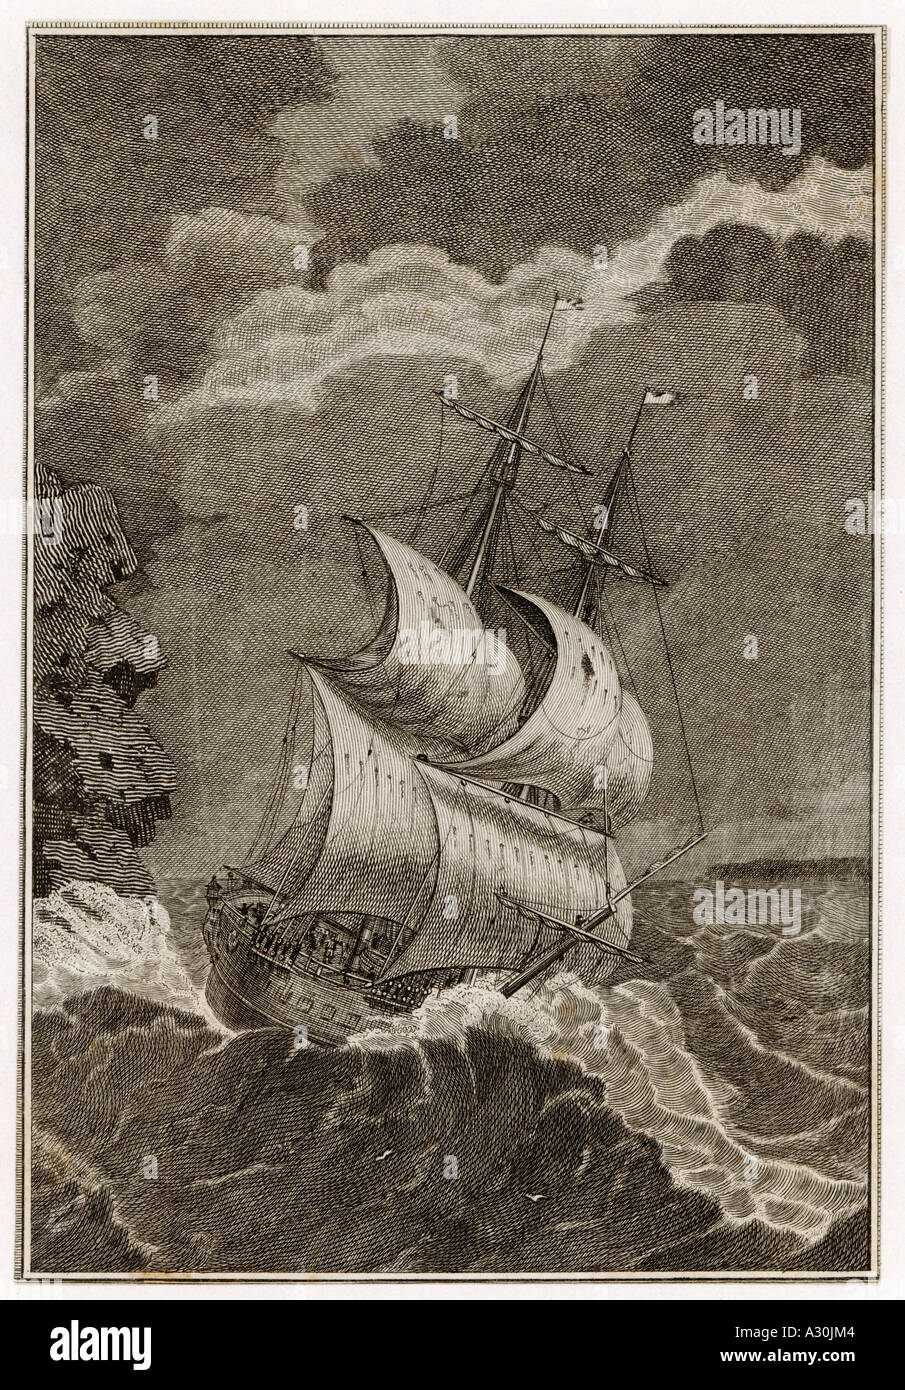 Cavendish Magellan - Stock Image